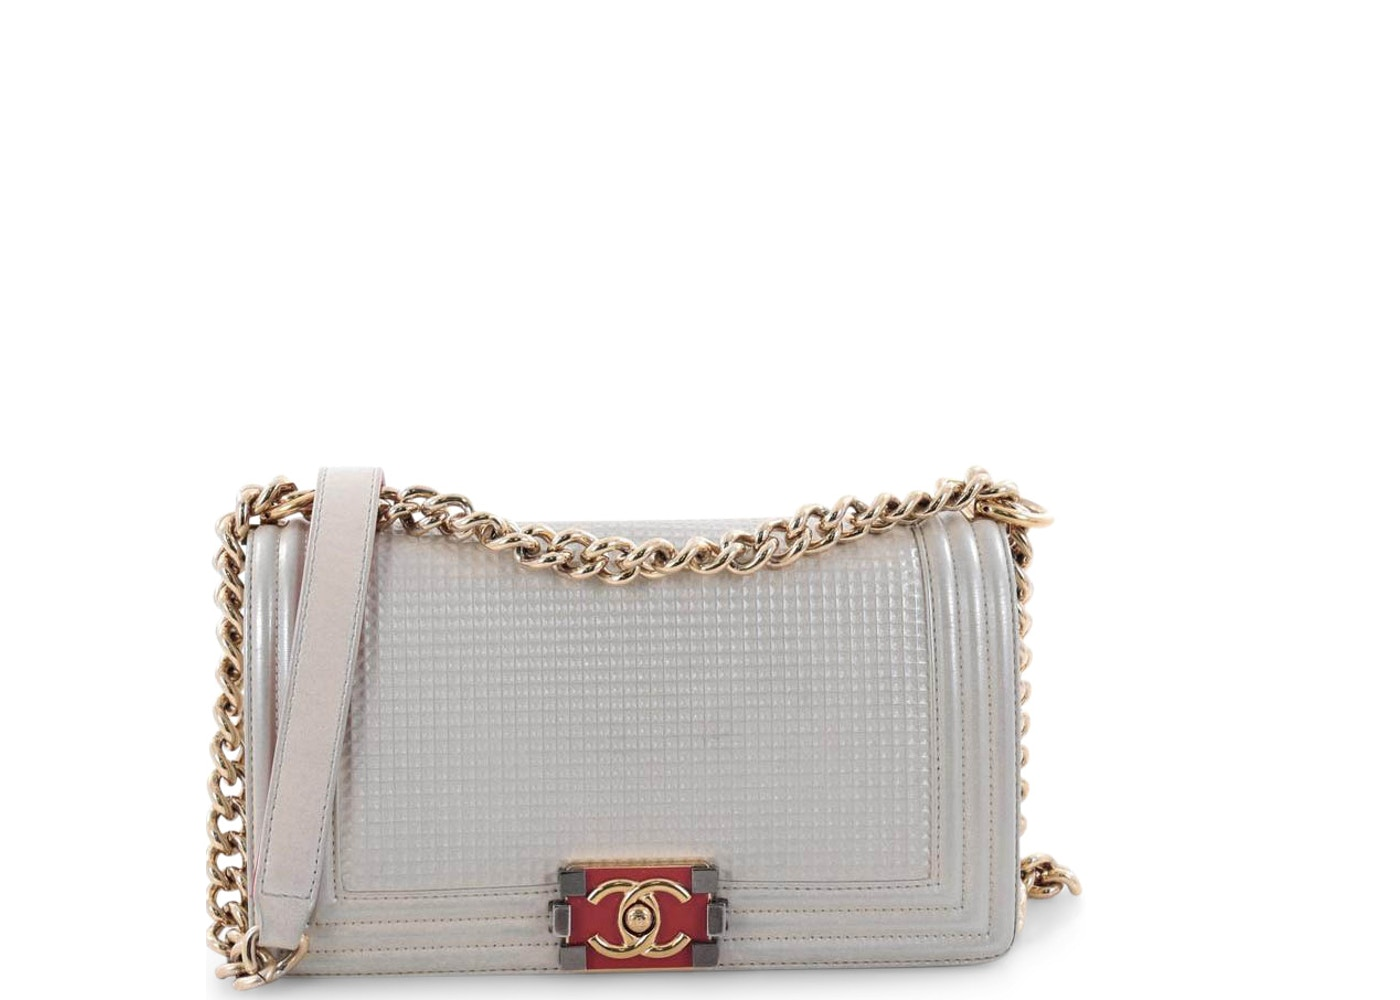 5edfd309d61ccd Chanel Boy Flap Bag Cube Embossed Old Medium Pearl. Cube Embossed Old Medium  Pearl